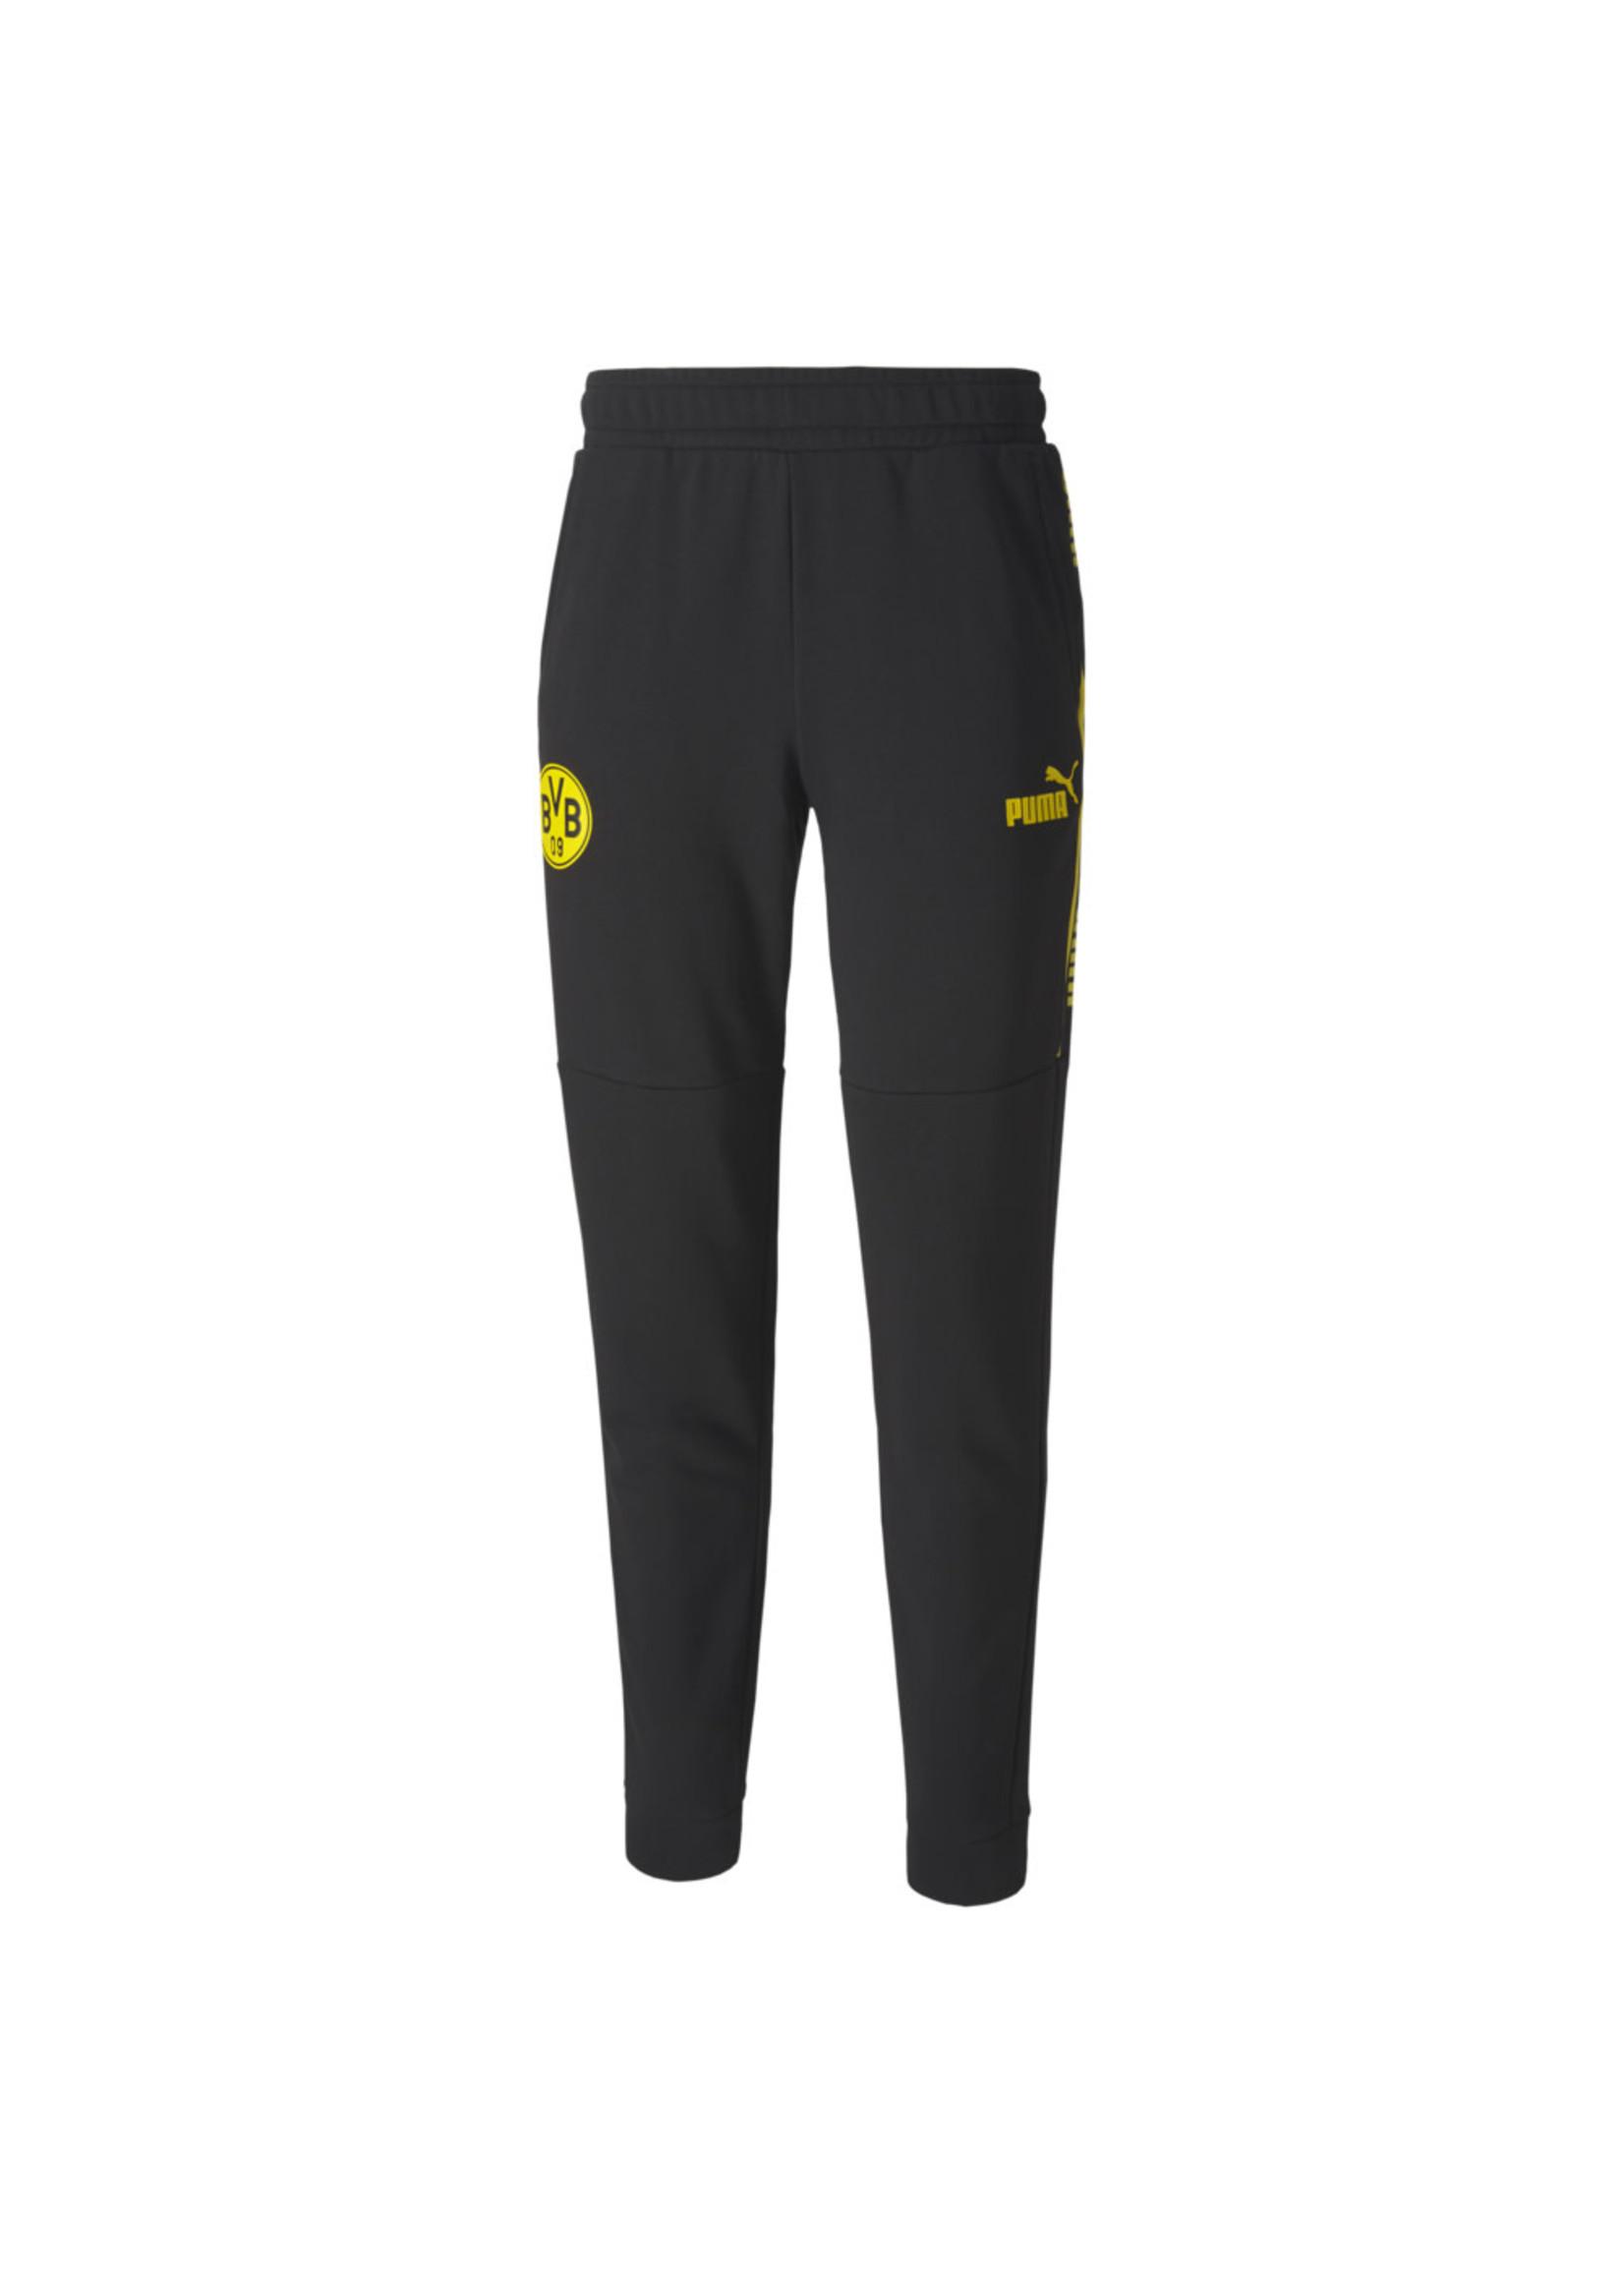 Puma Borussia Dortmund Track Pants